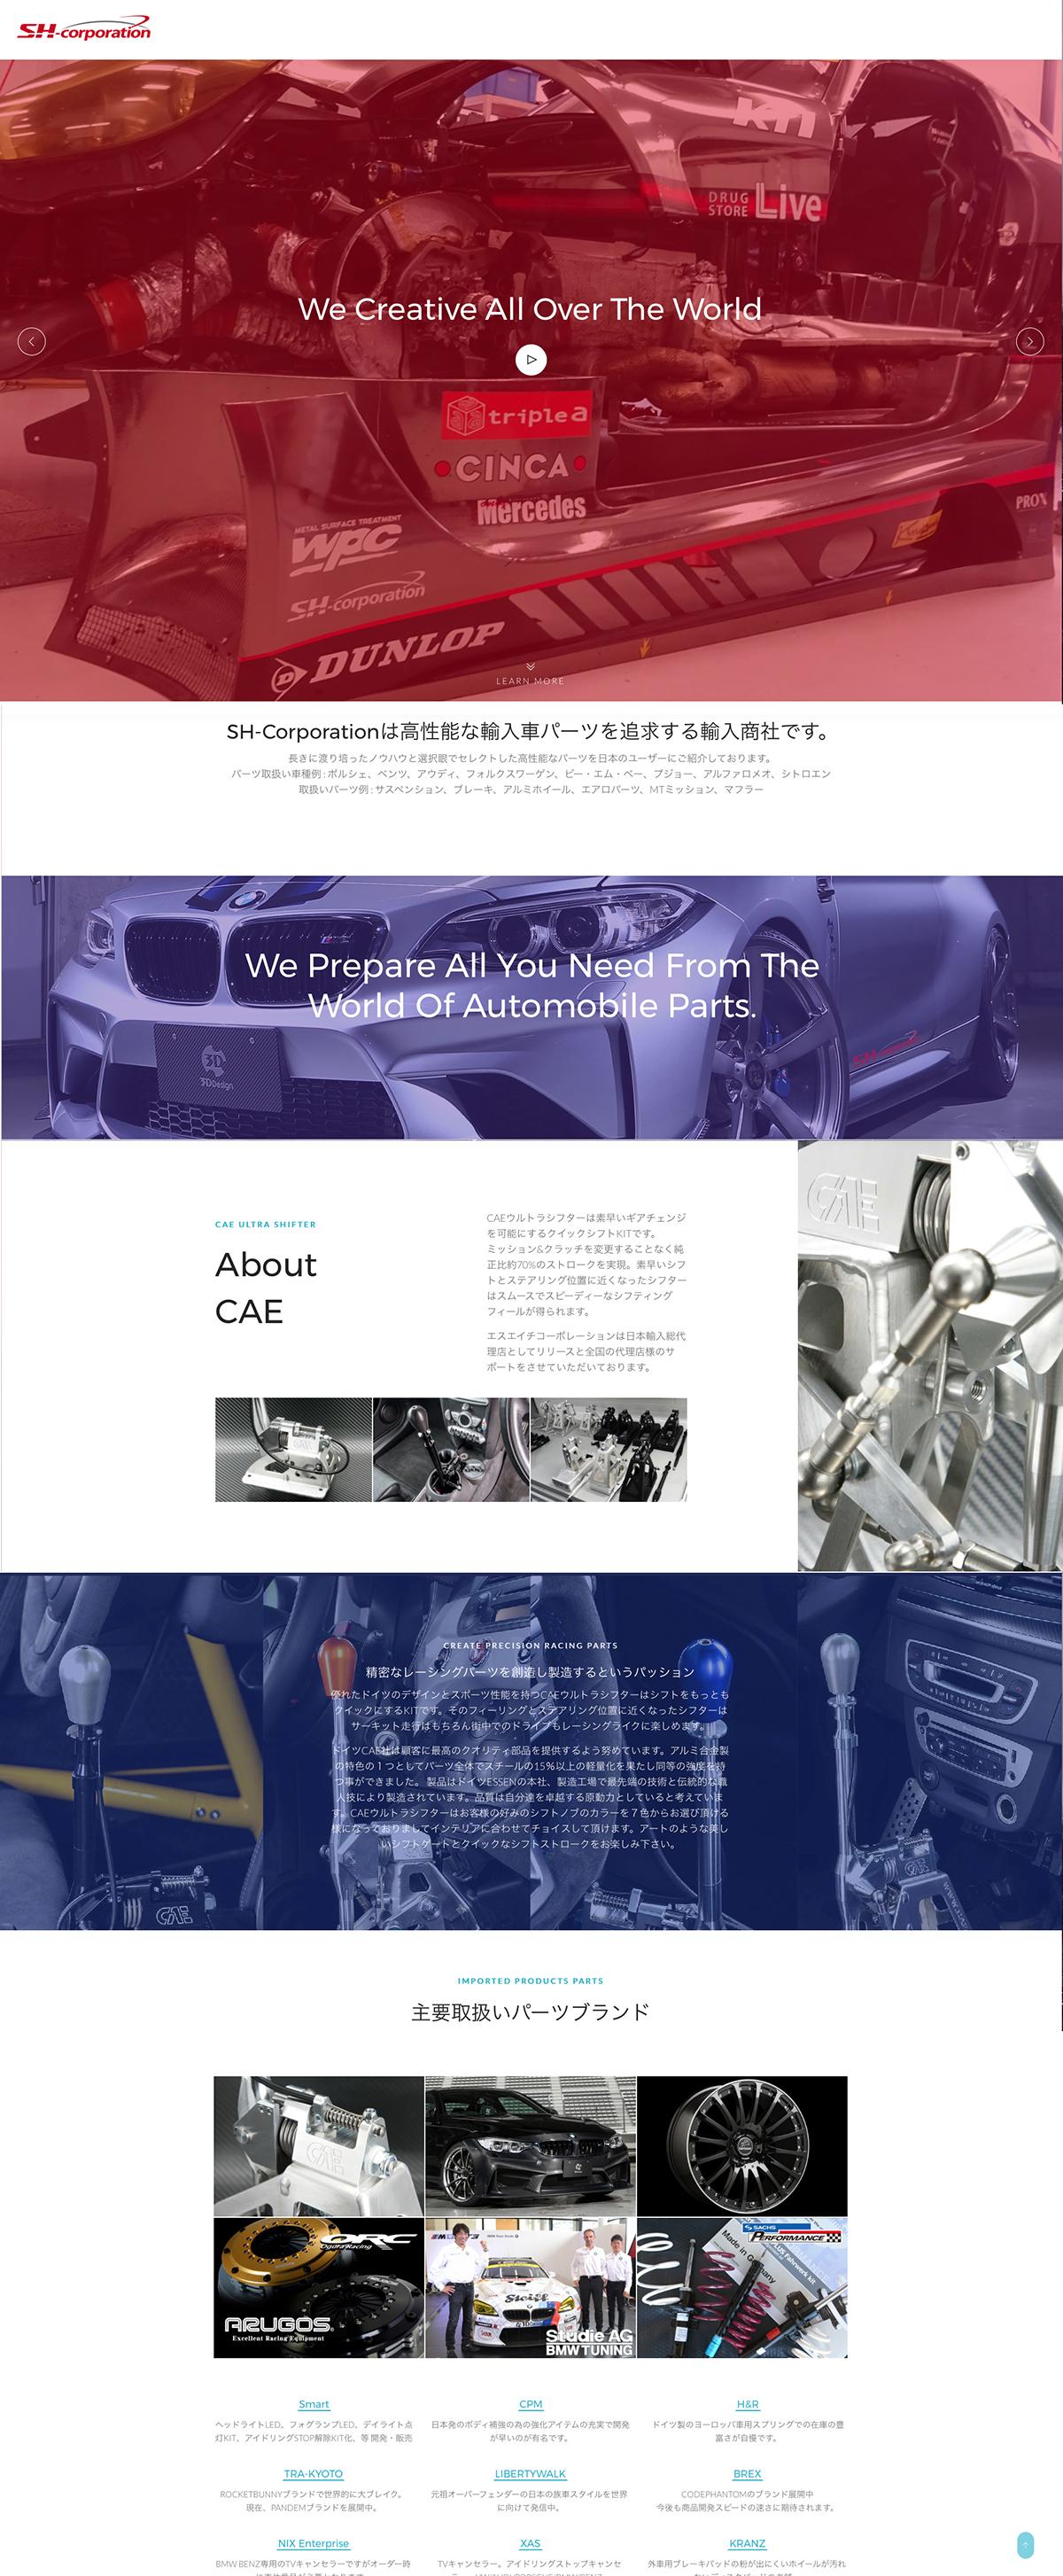 SH-corporation,Ltd.